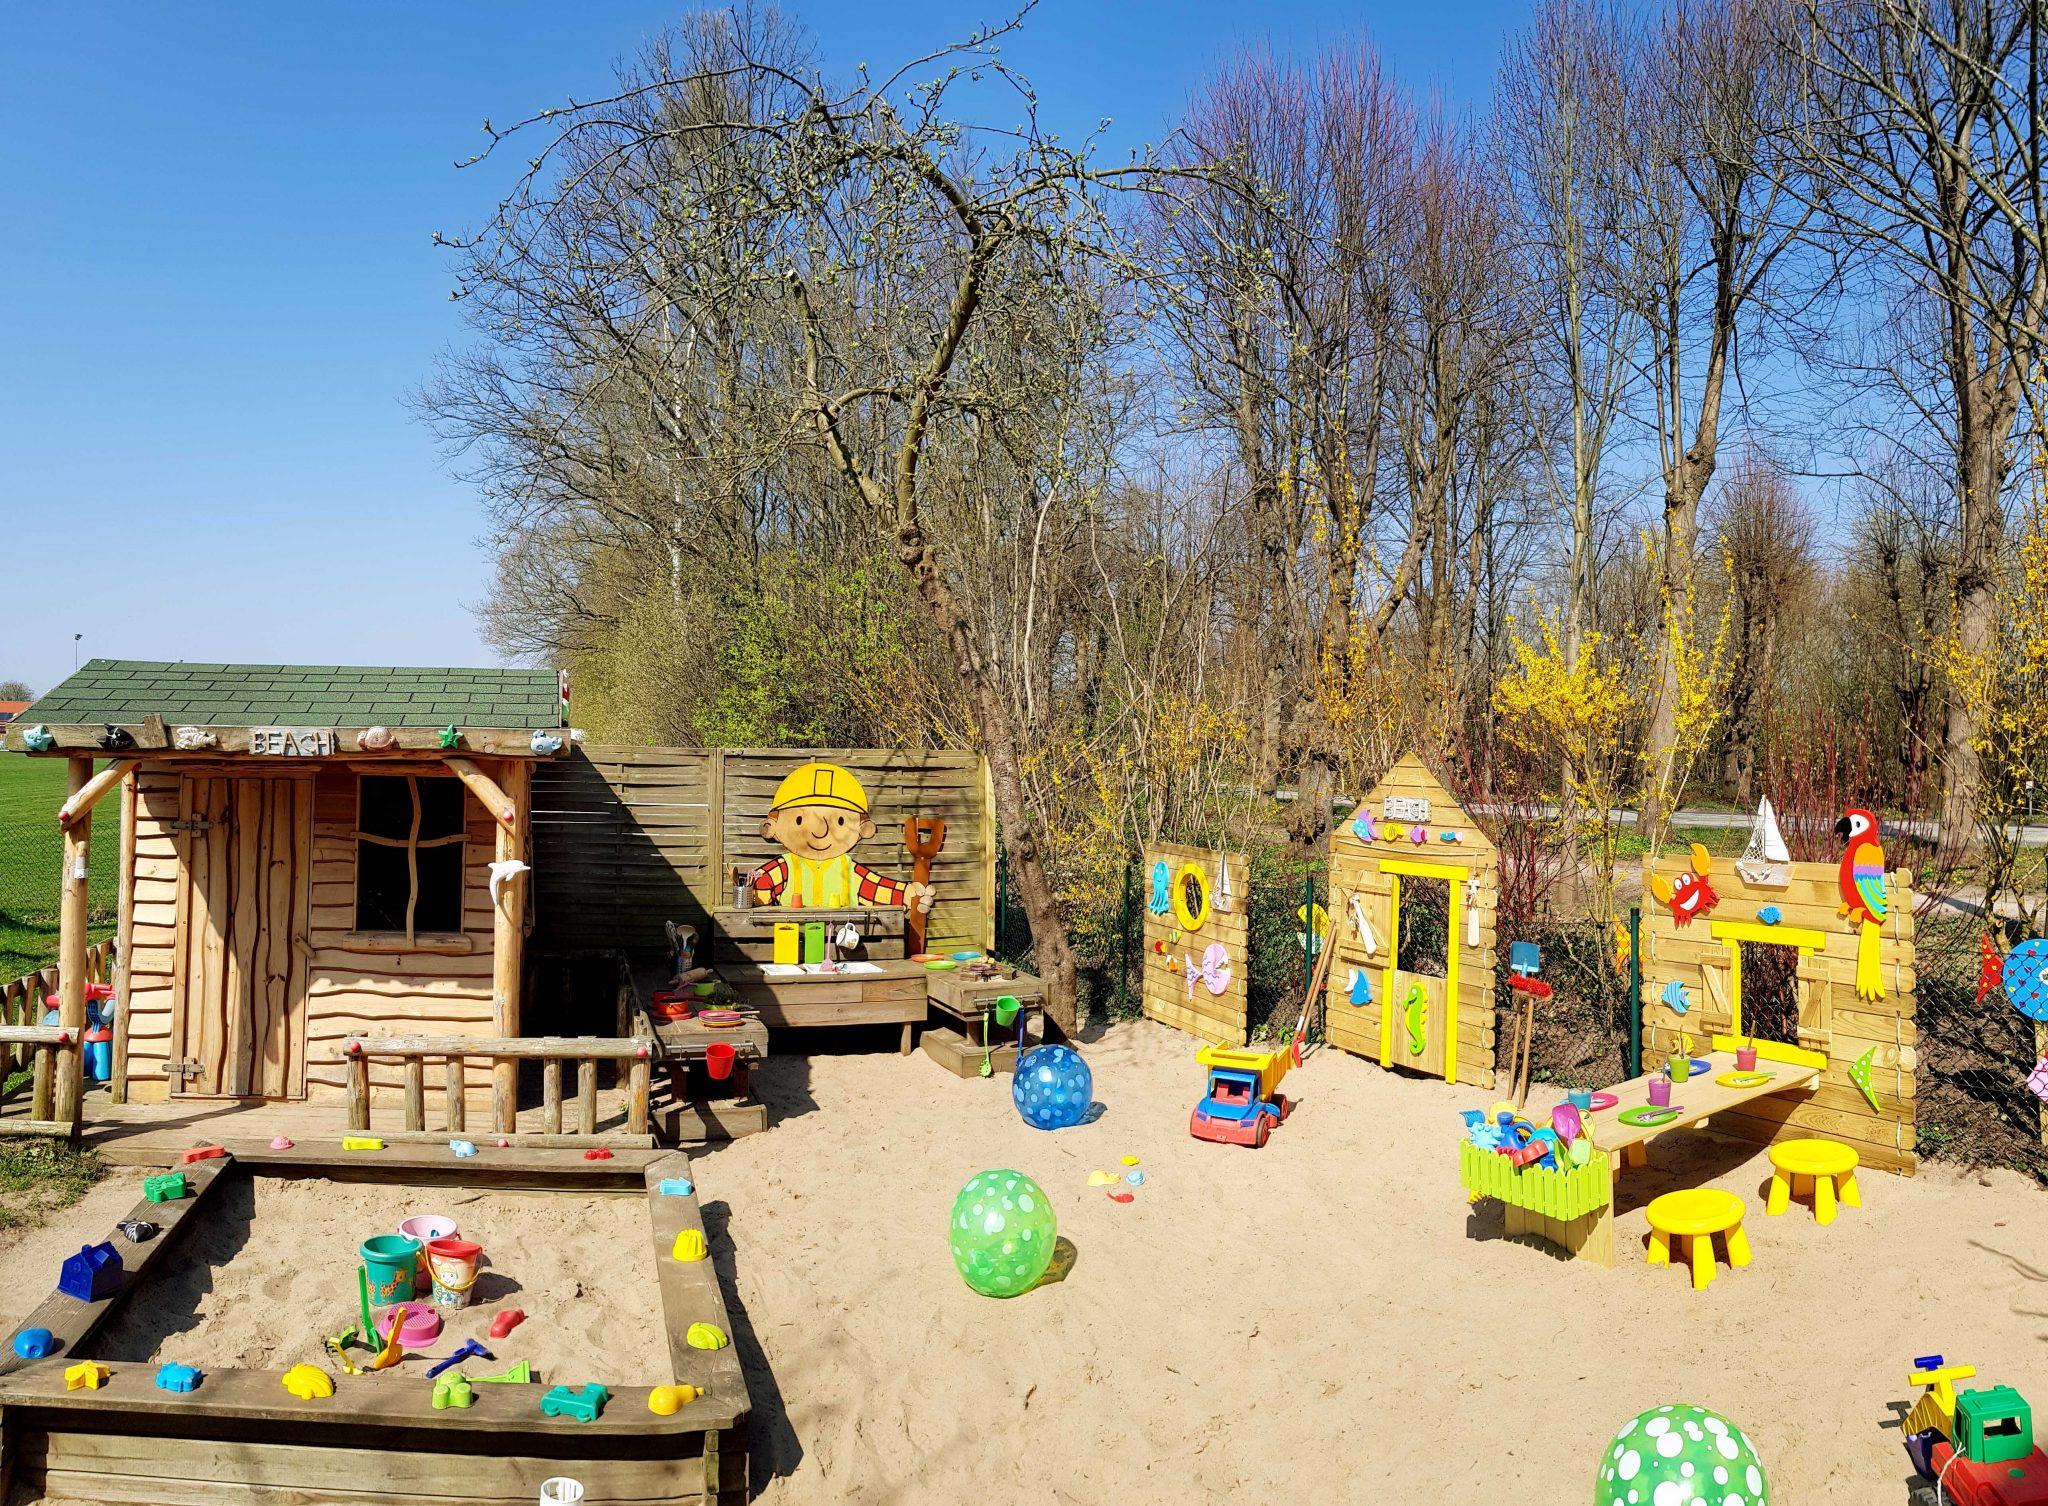 Kita Kid Zone Kinderbetreuung Garten1 22 - Kinder-Beachclub